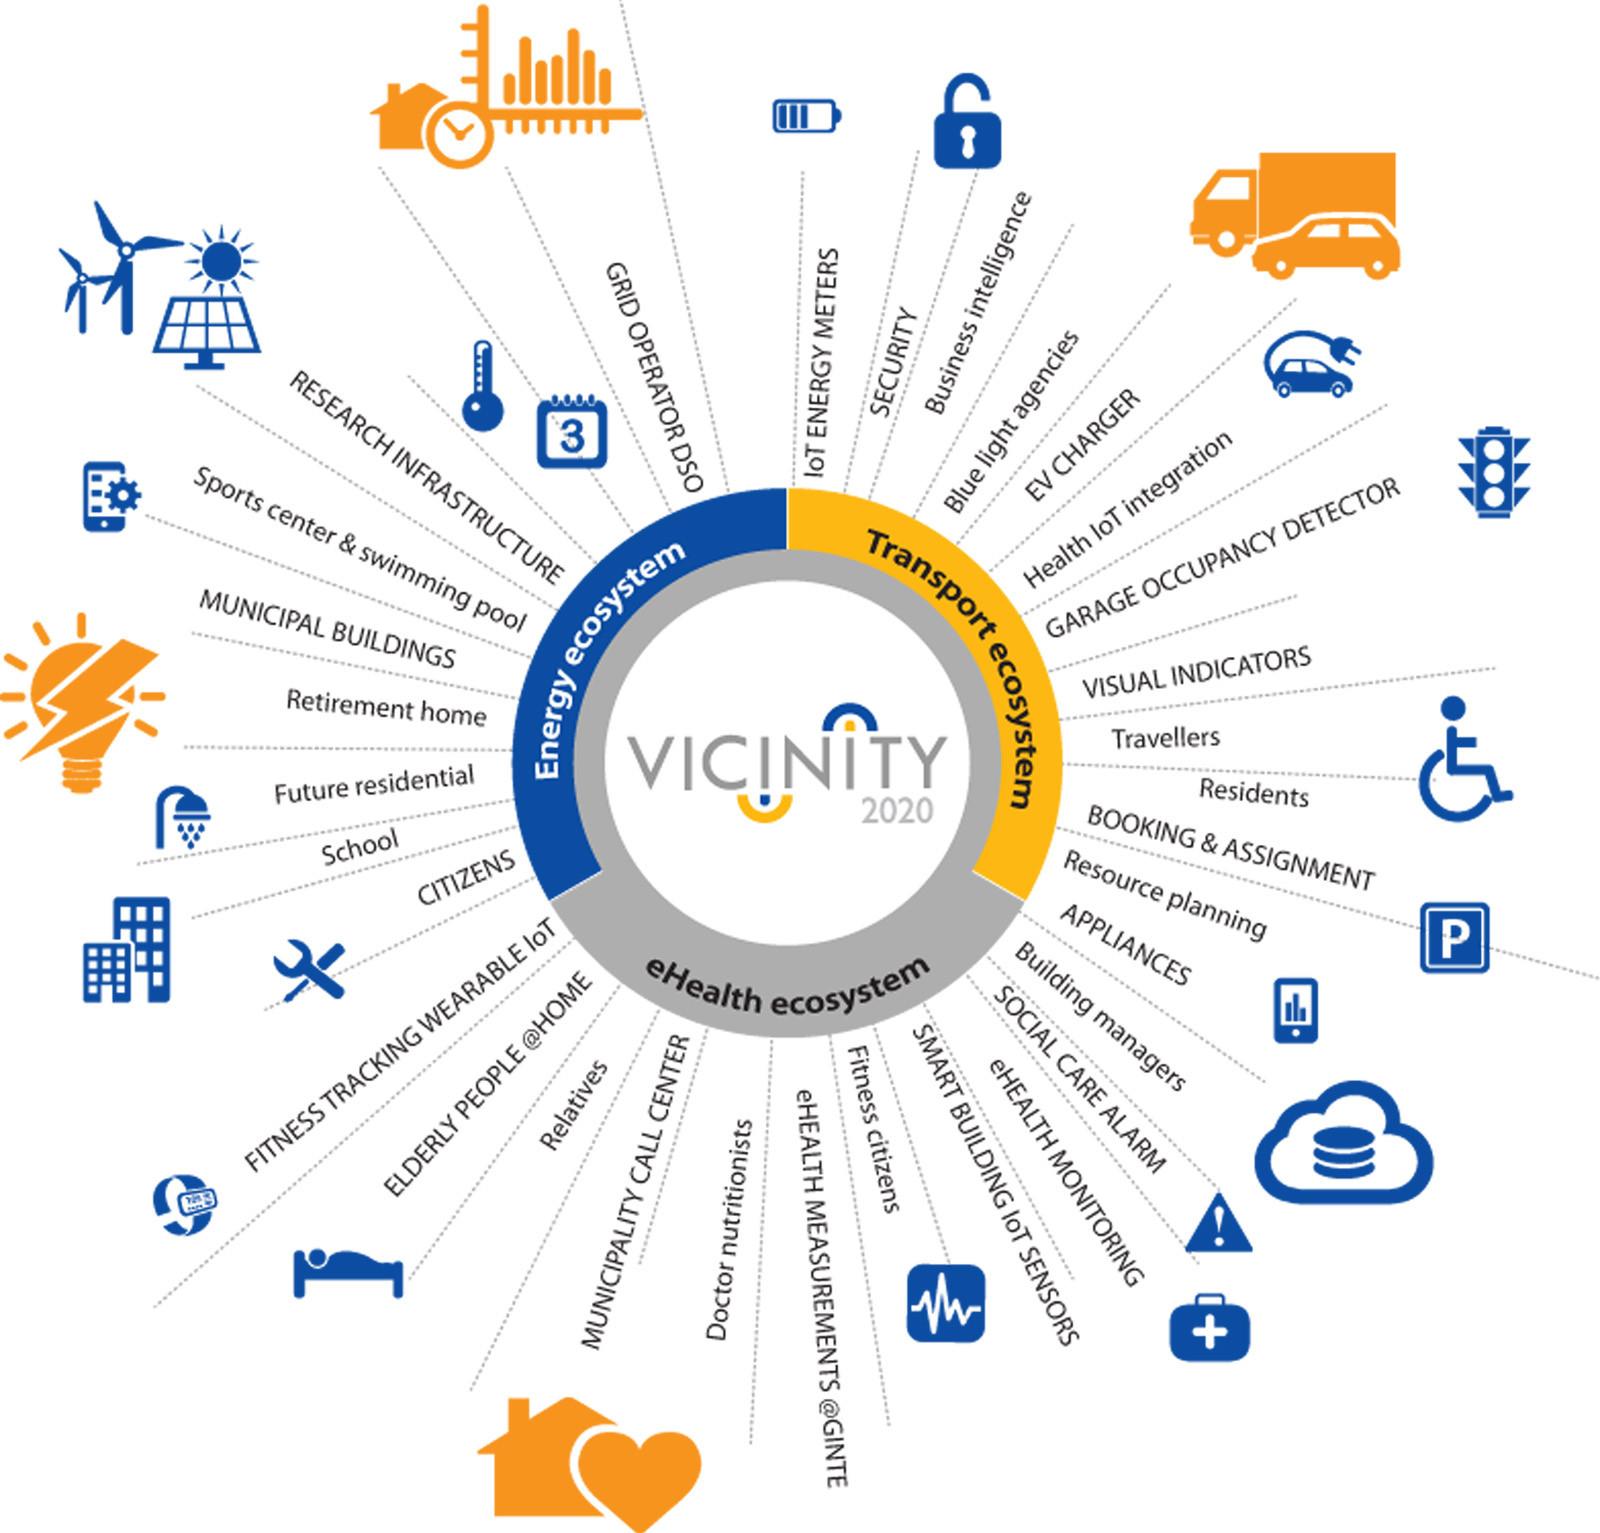 Vicinity, the virtual neighborhood for IoT